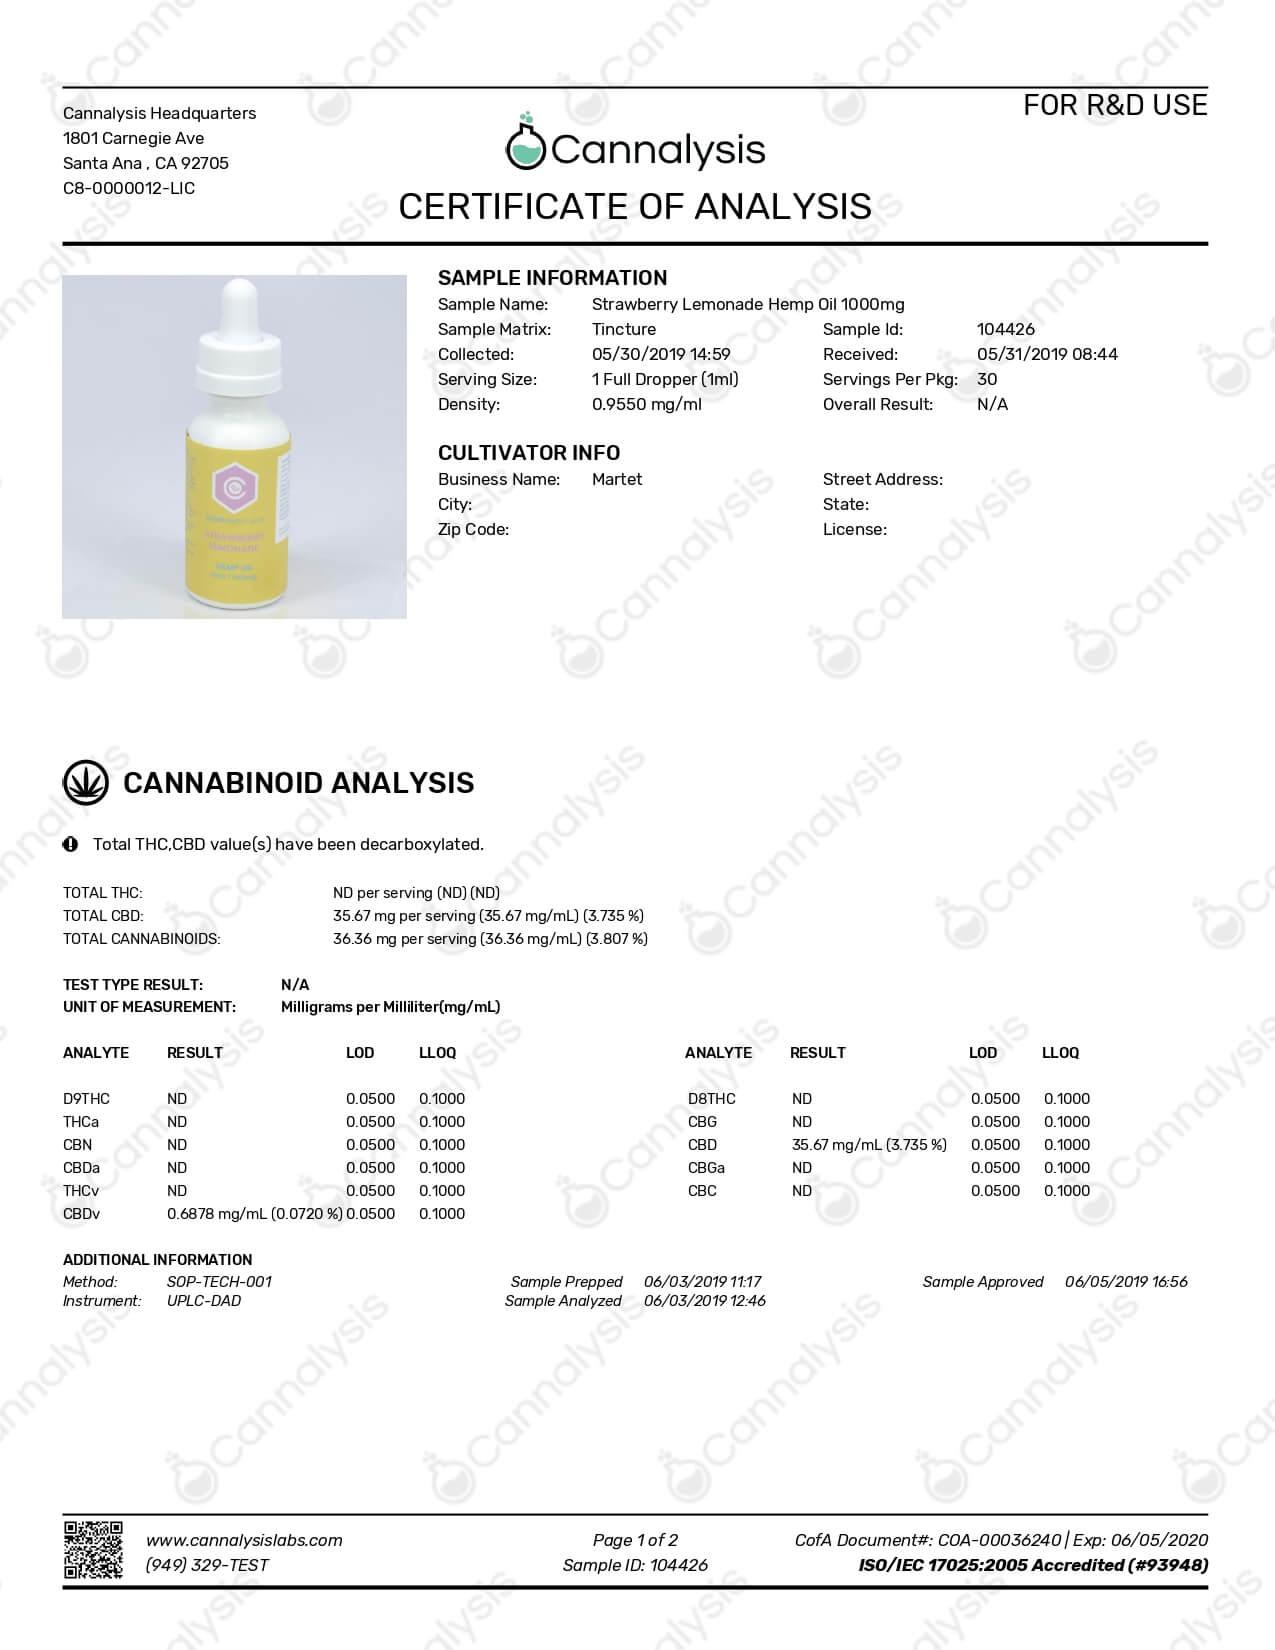 Clear Bright Days CBD Tincture Strawberry Lemonade Lab Report